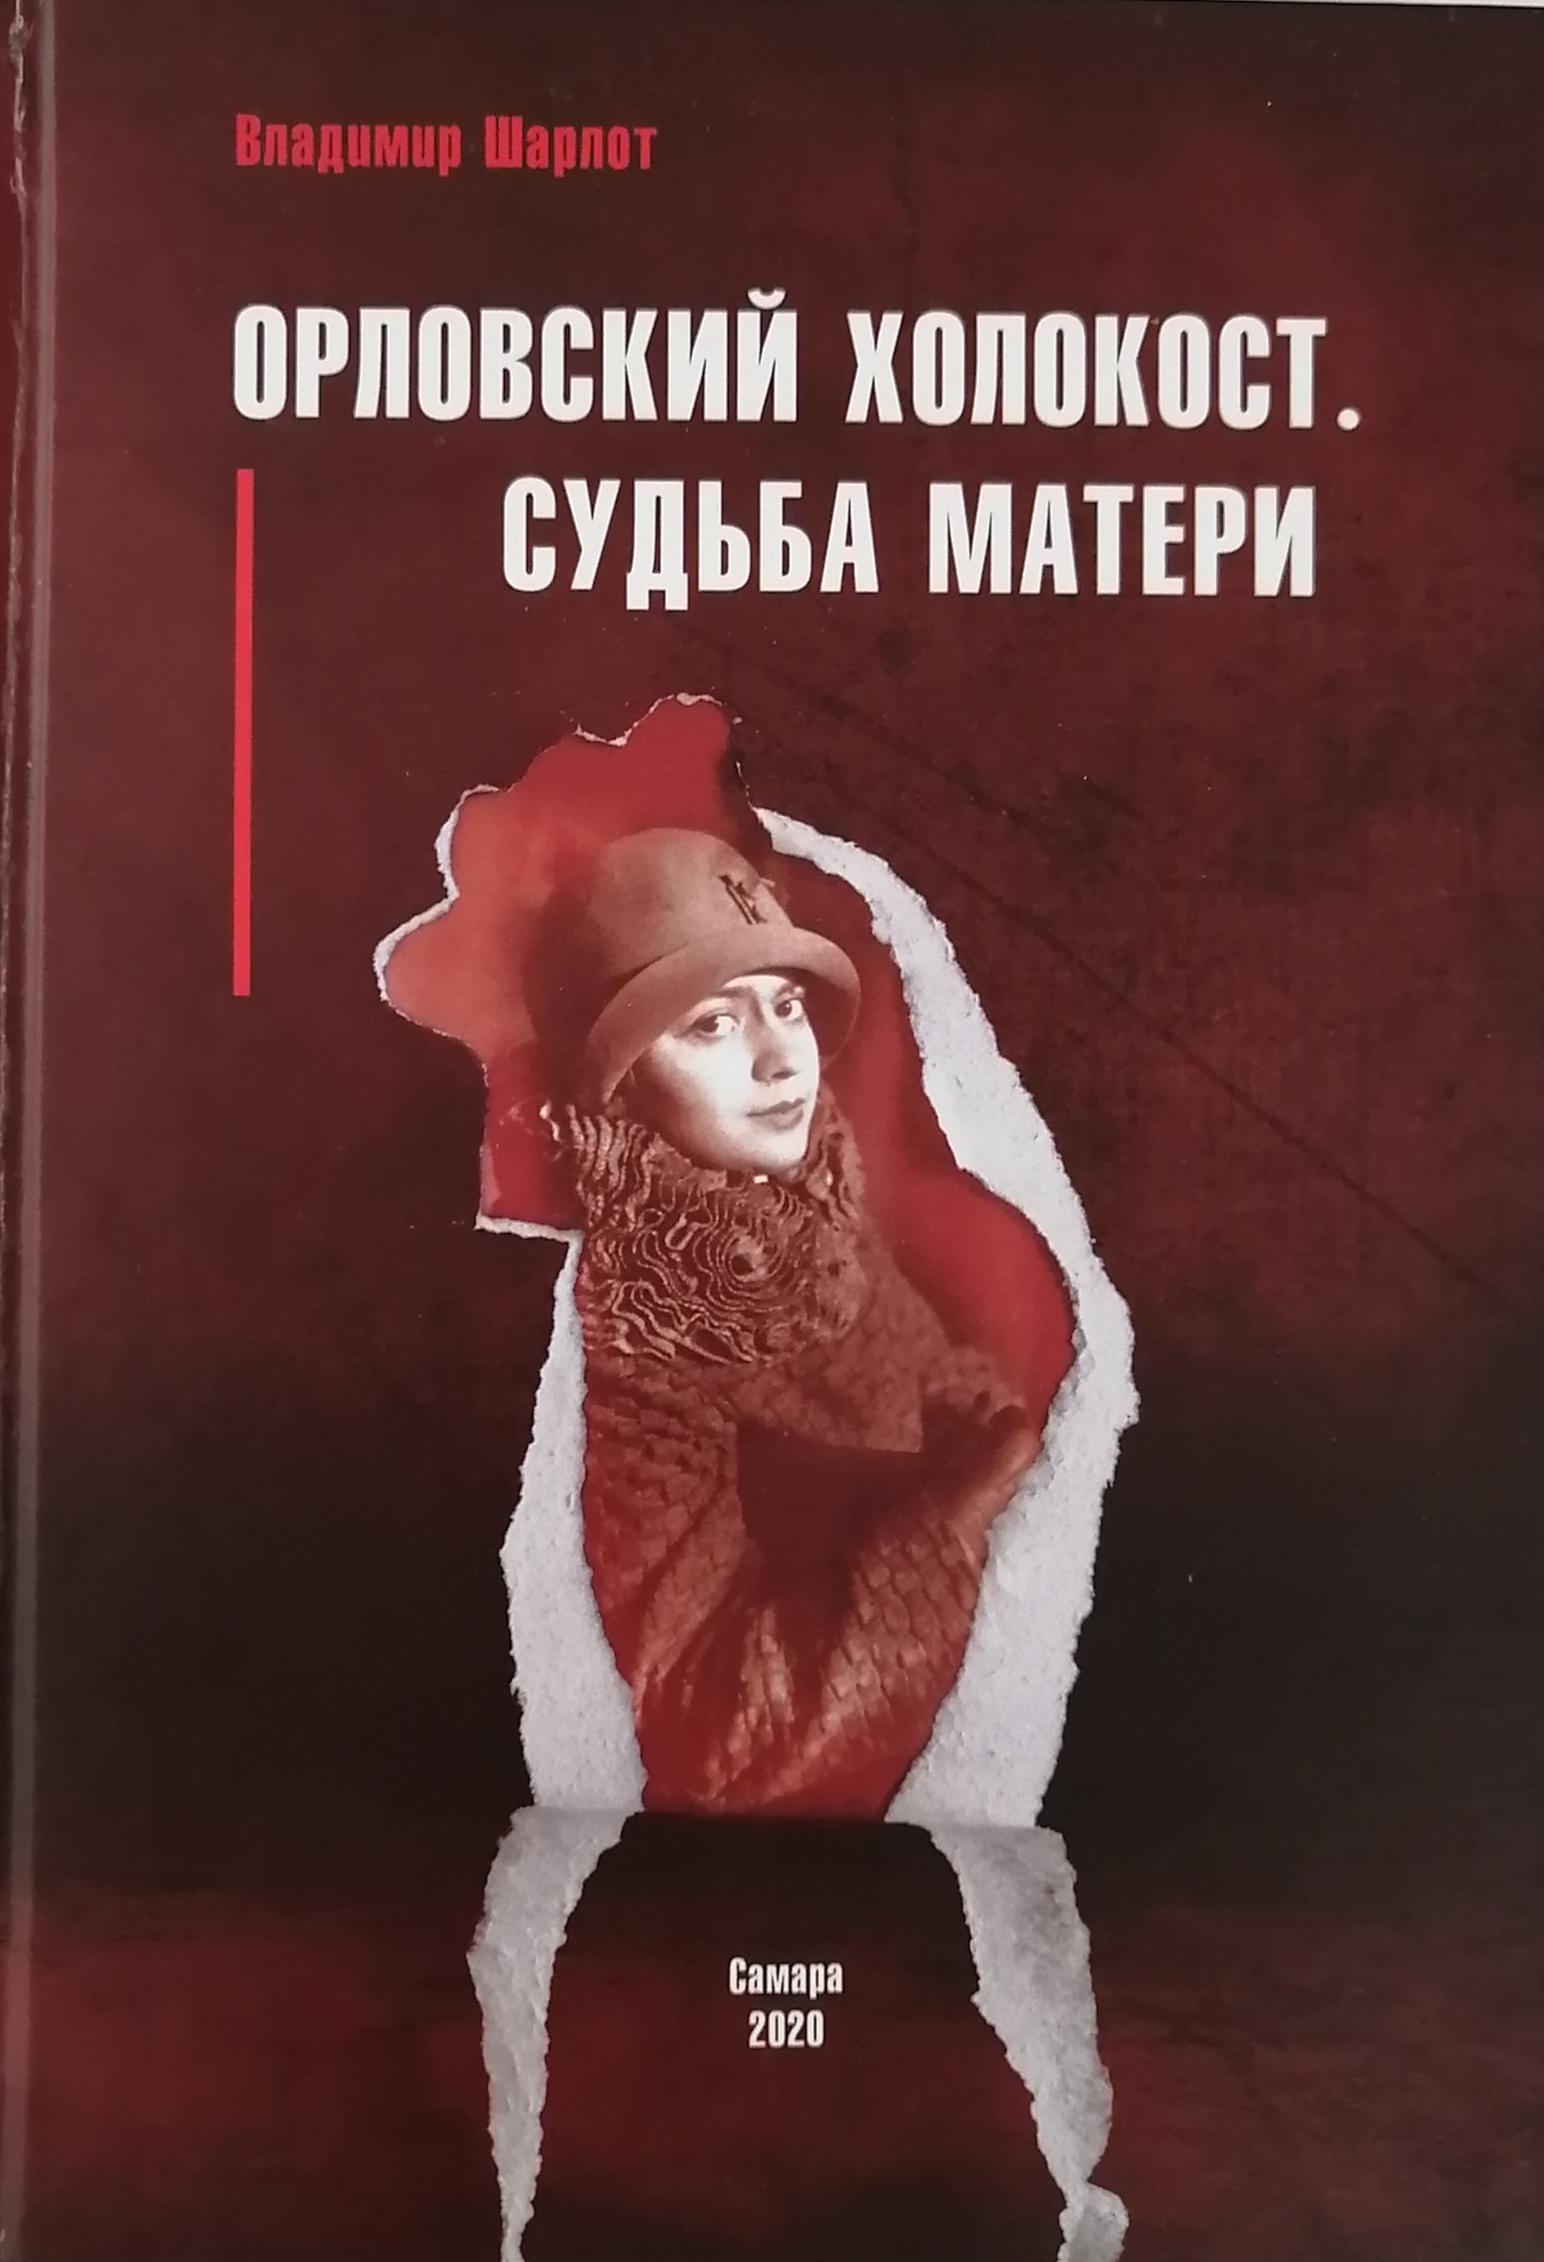 Орловский Холокост. Судьба матери